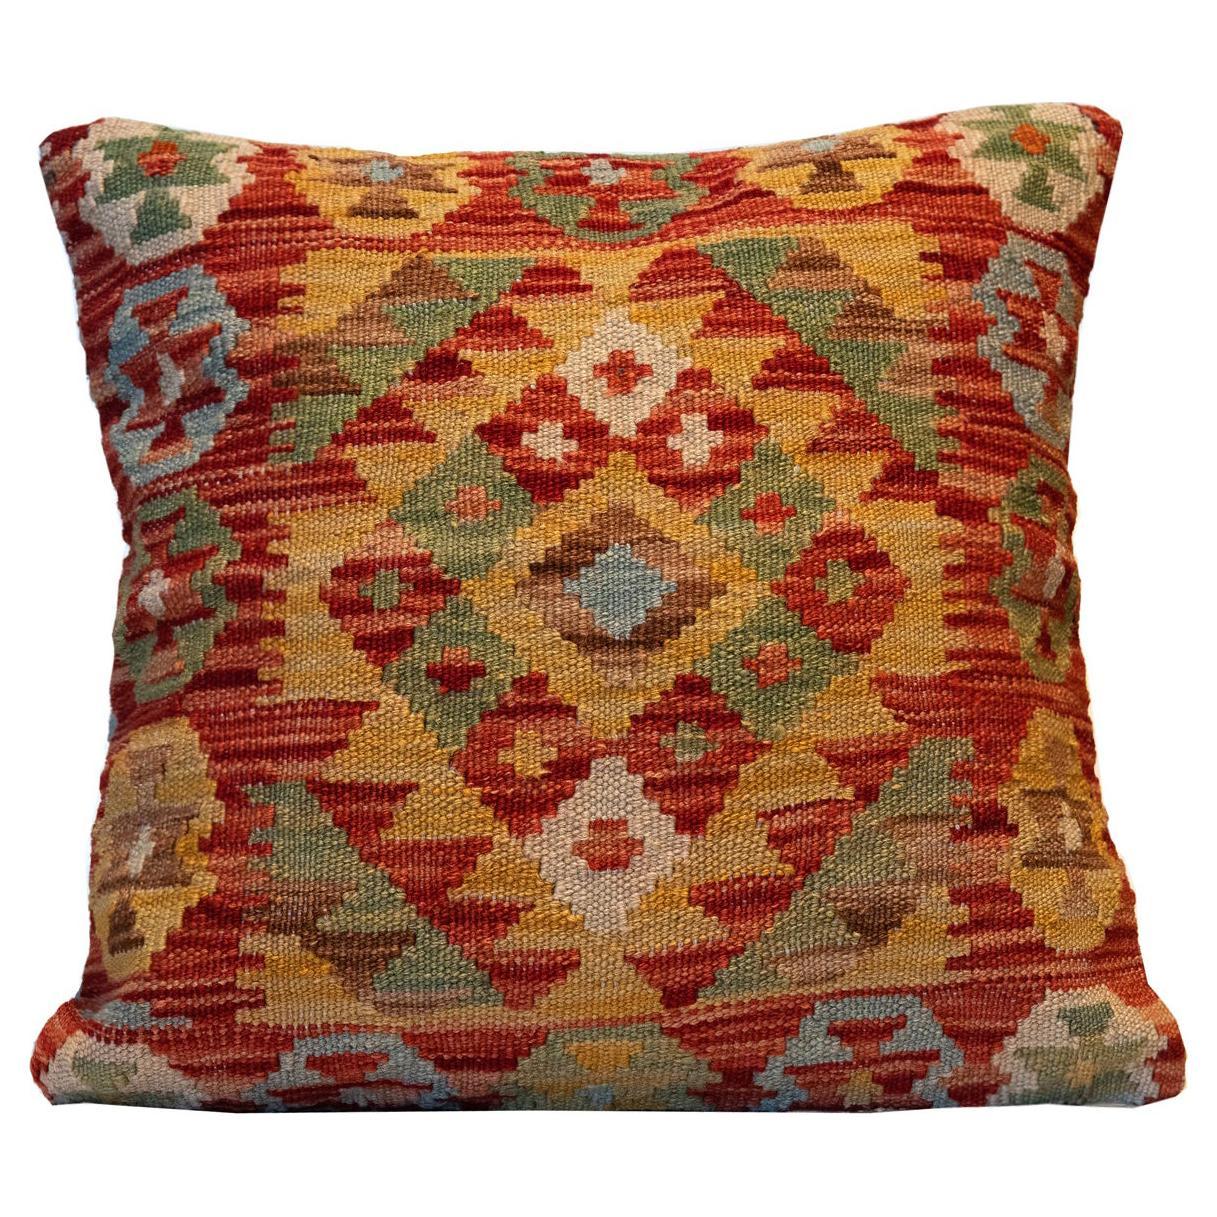 Wool Cushion Cover, Kilims Handwoven Vintage Orange Beige Scatter Pillow